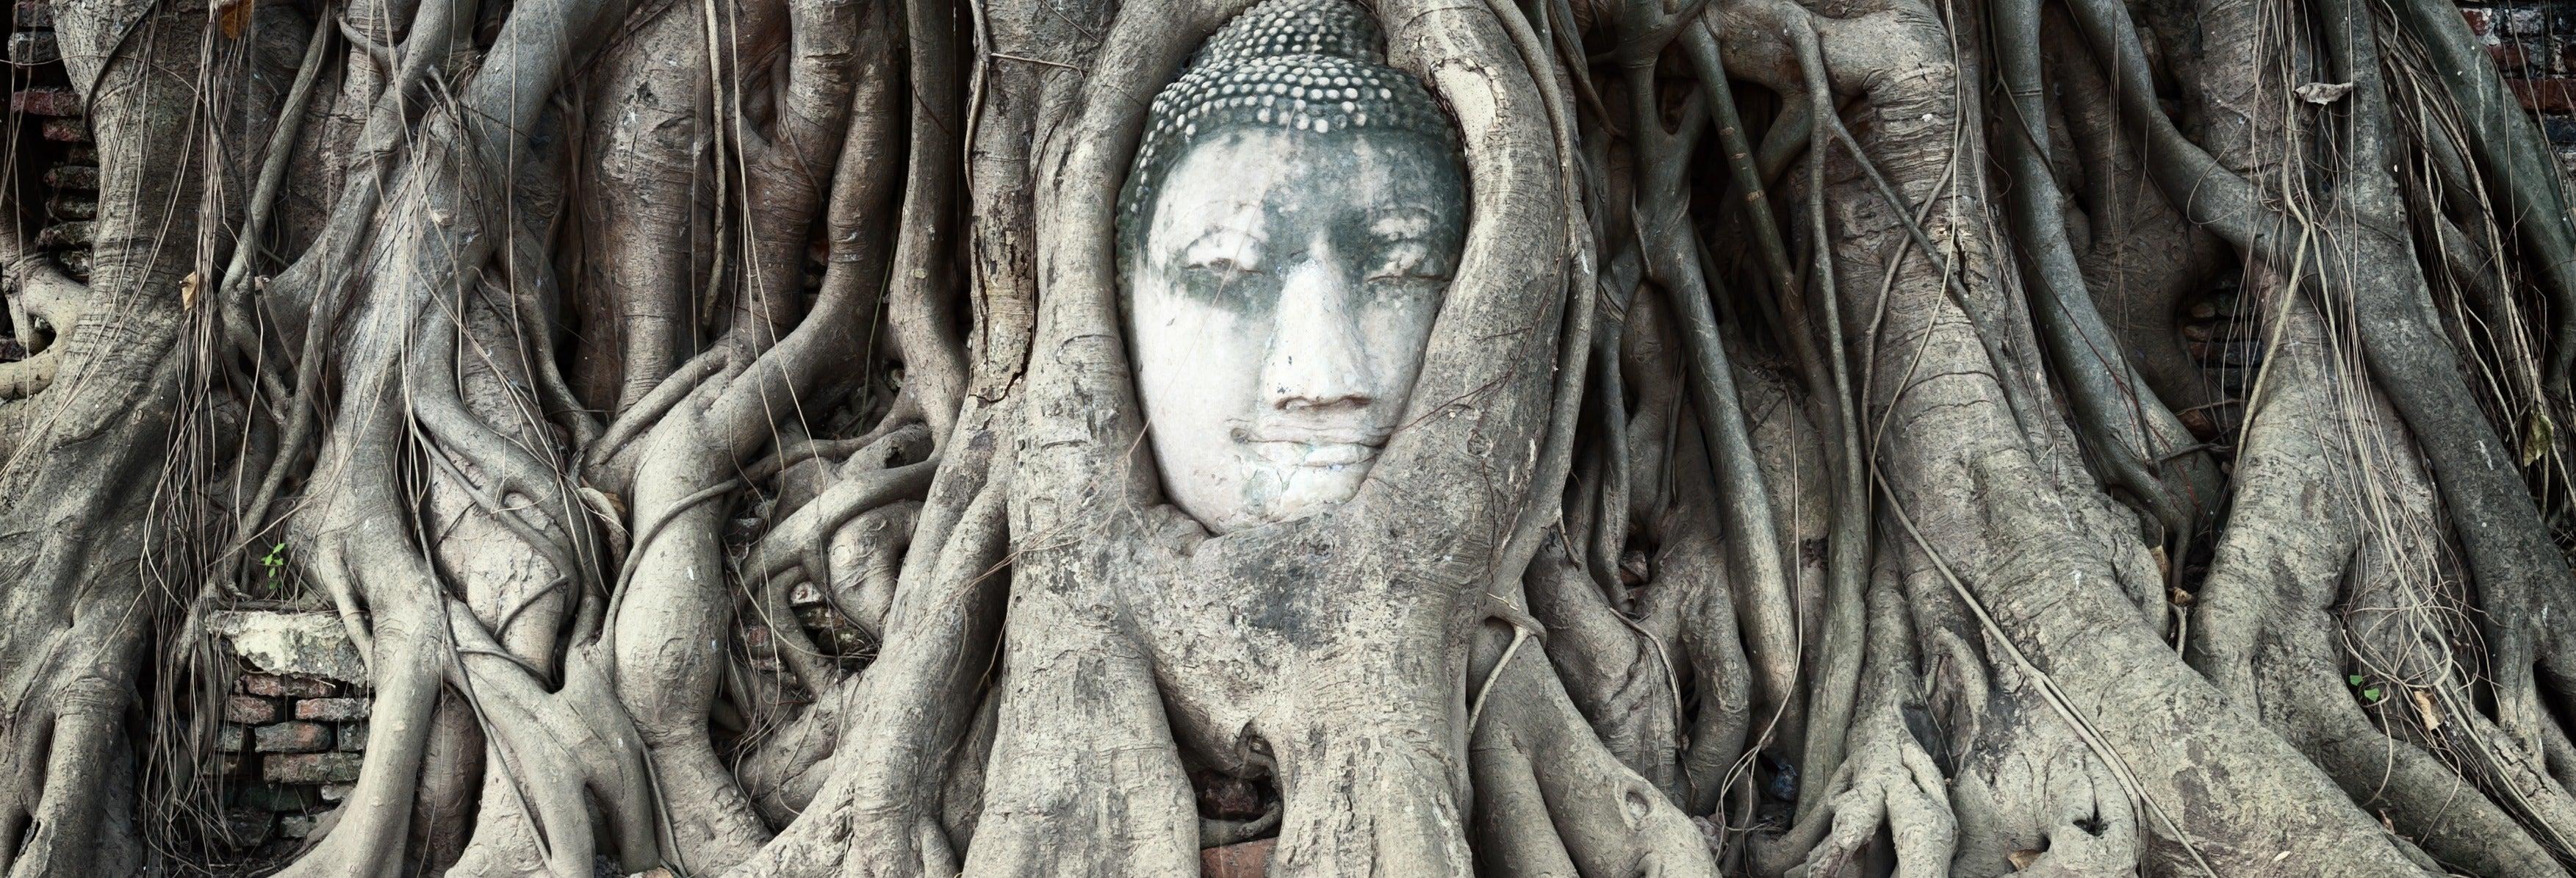 Croisière Thanatharee de 2 ou 3 jours vers Ayutthaya